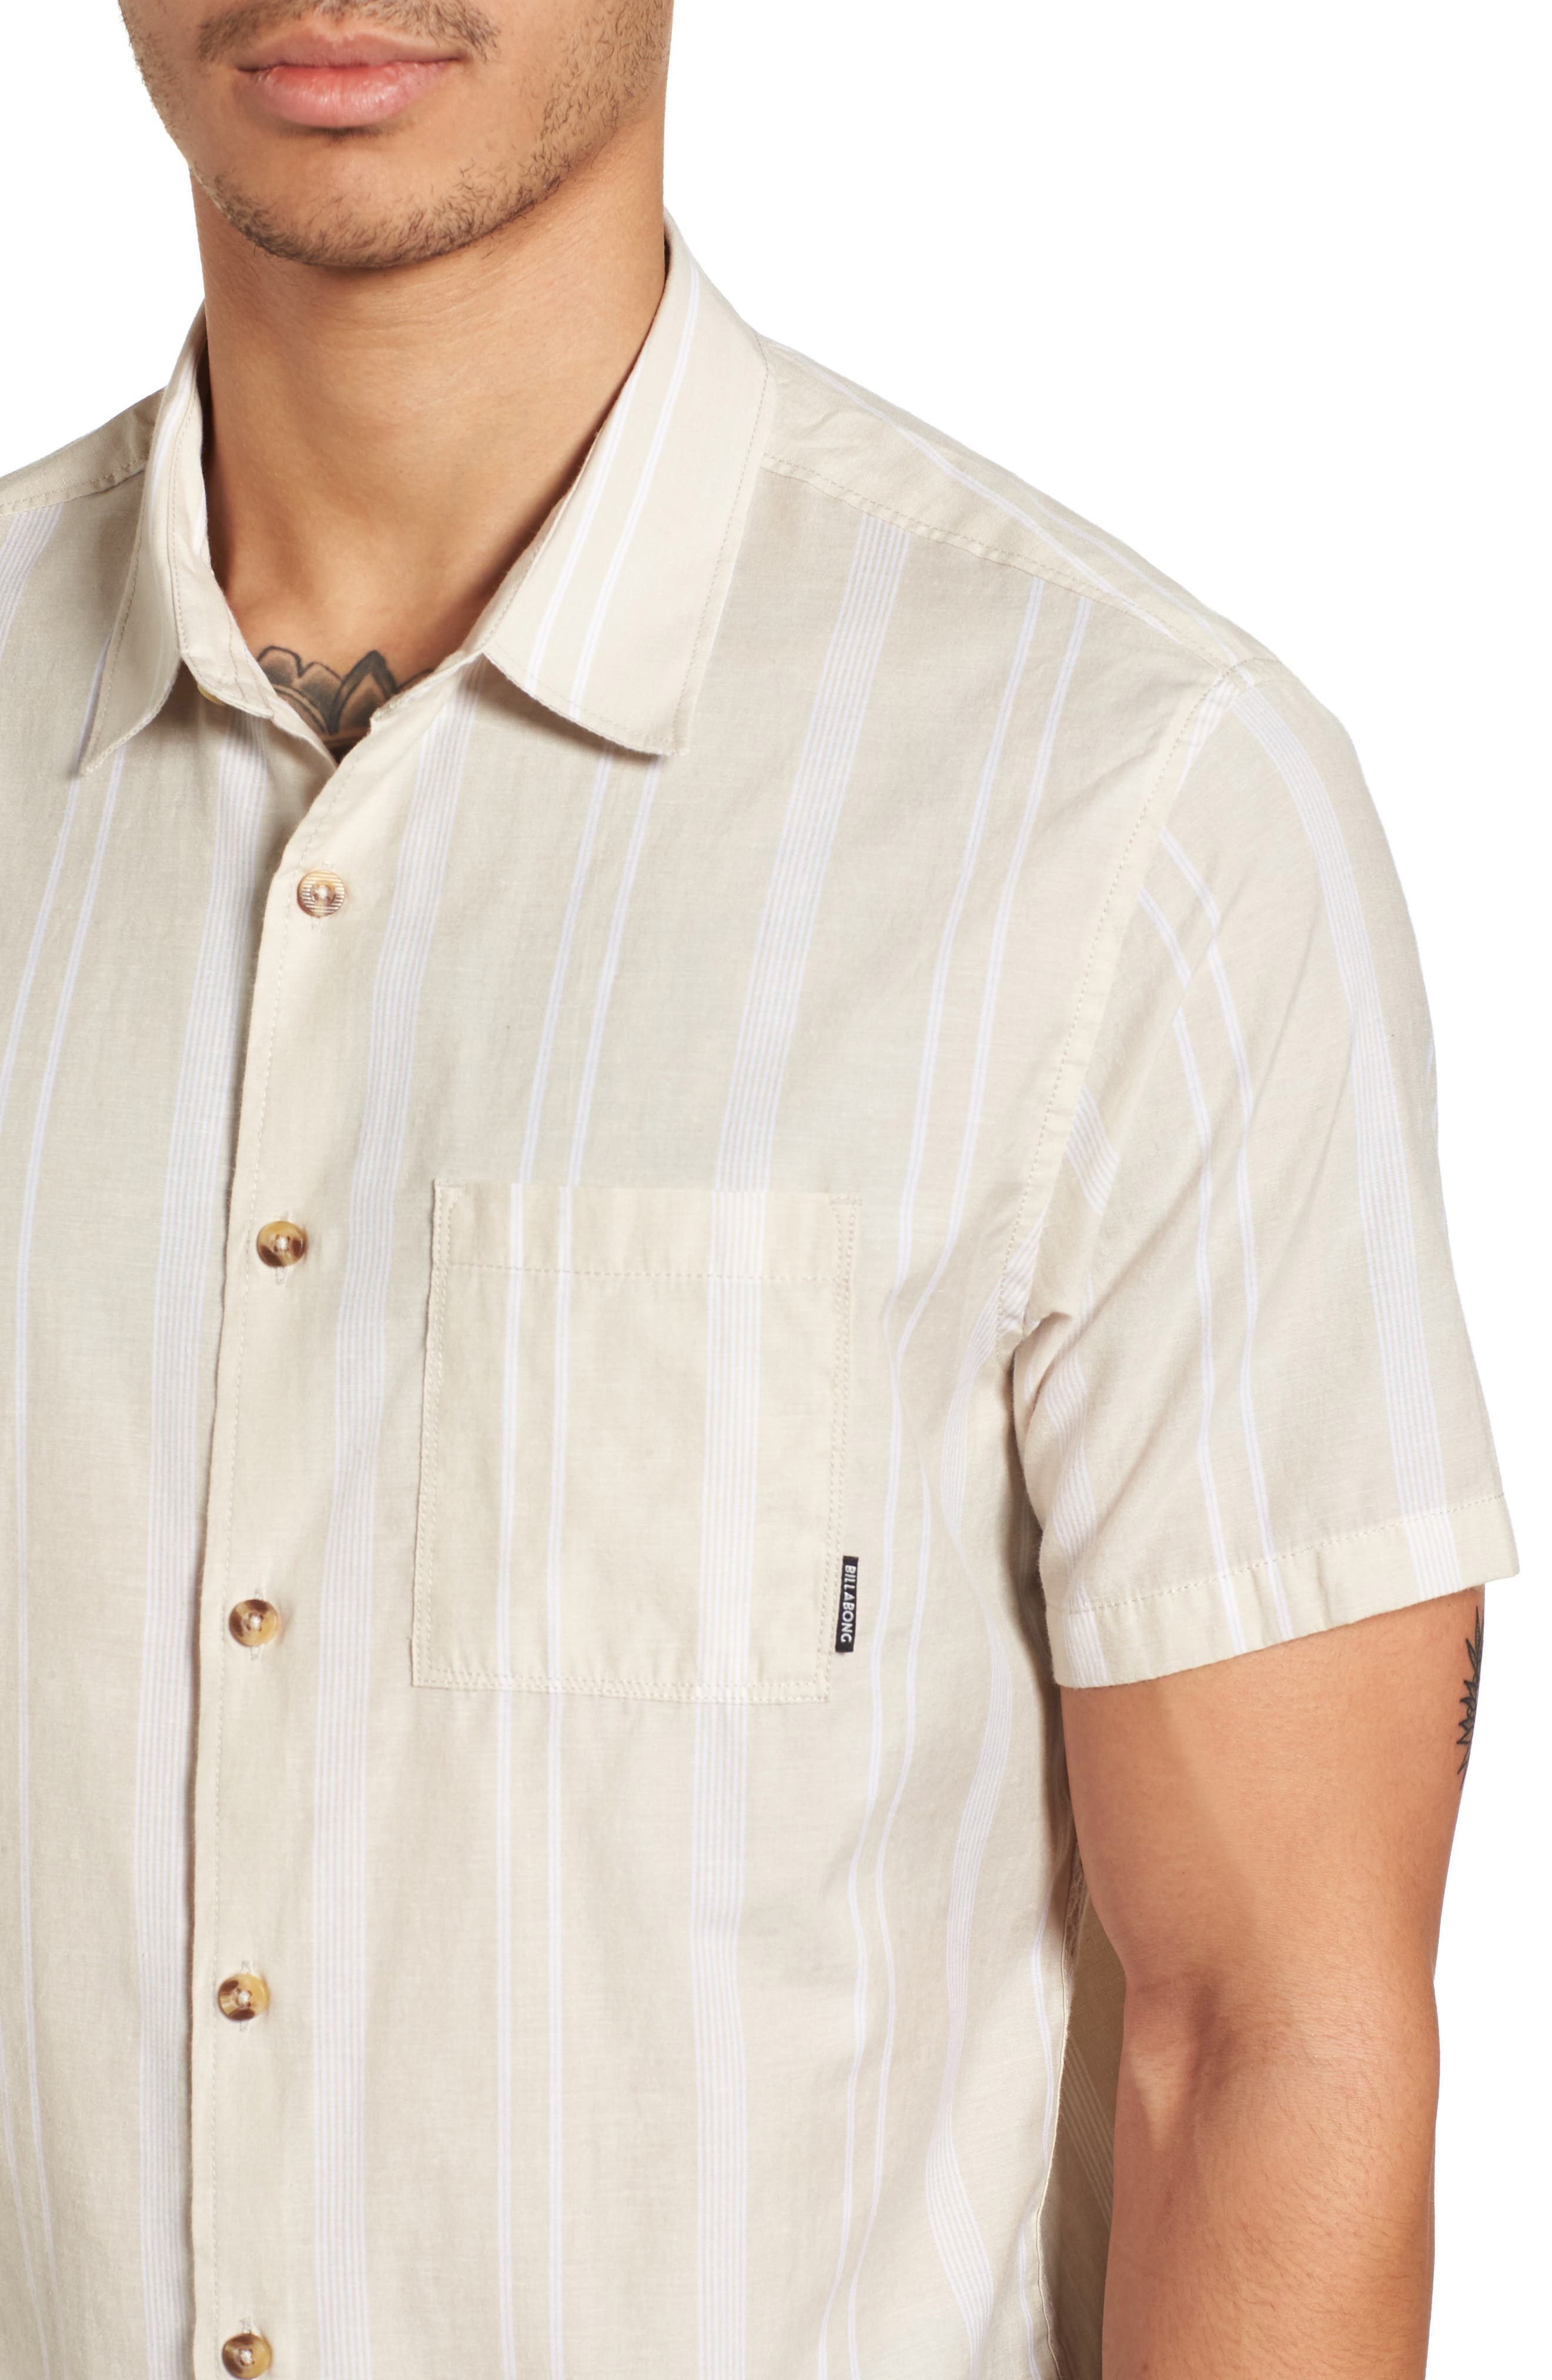 Alternate Image 2  - Billabong Donny Short Sleeve Shirt